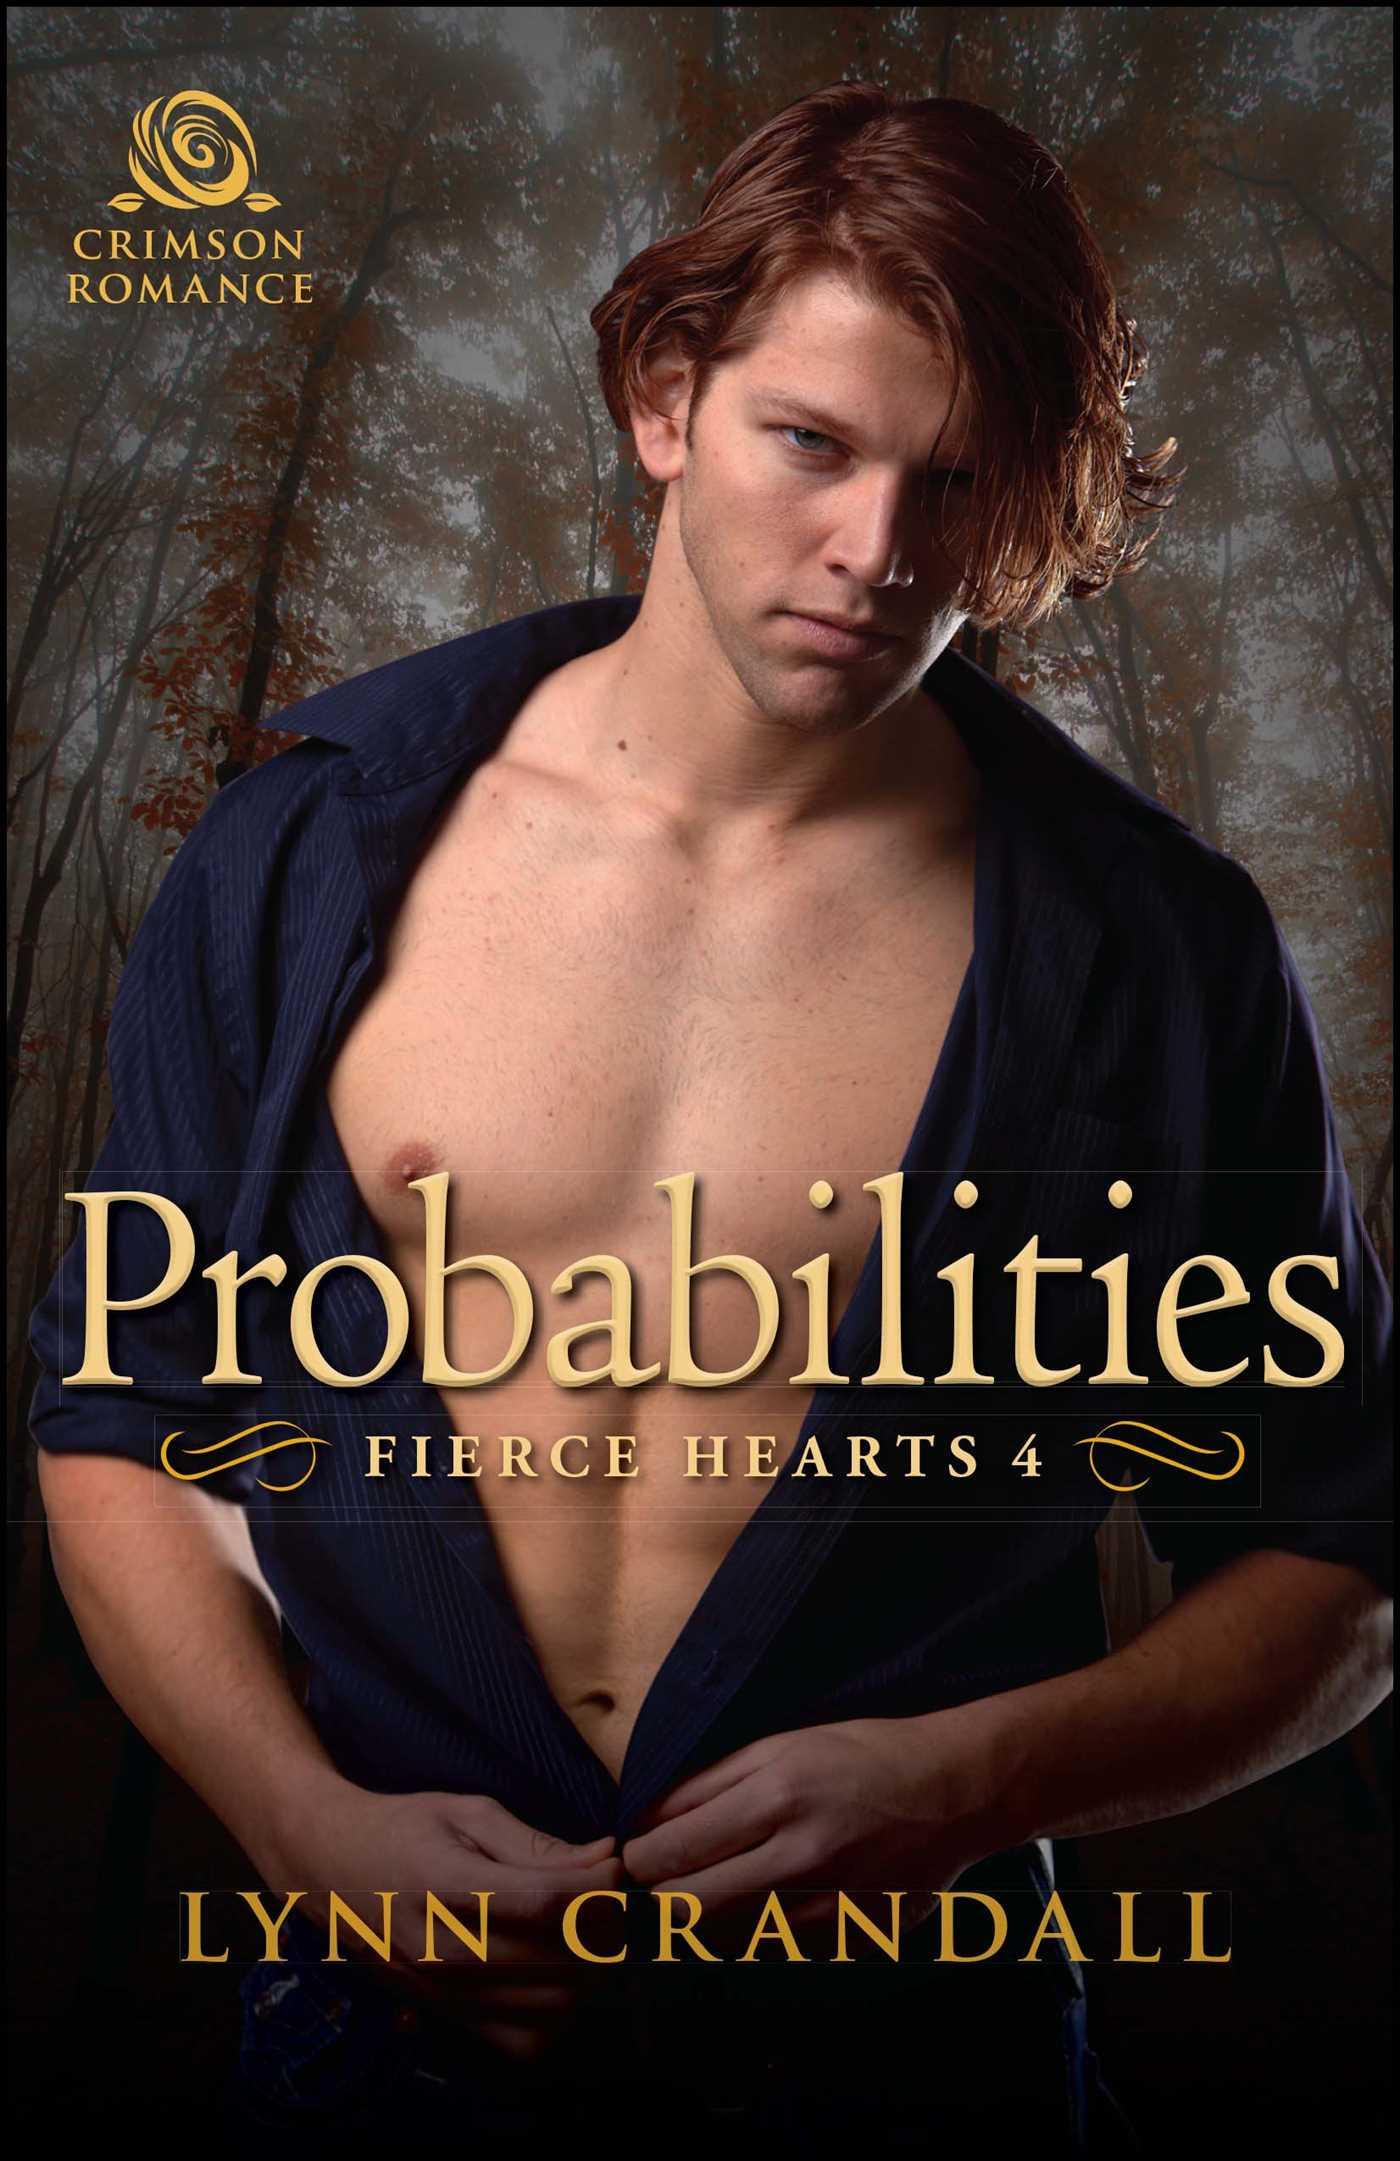 Probabilities 9781440589553 hr